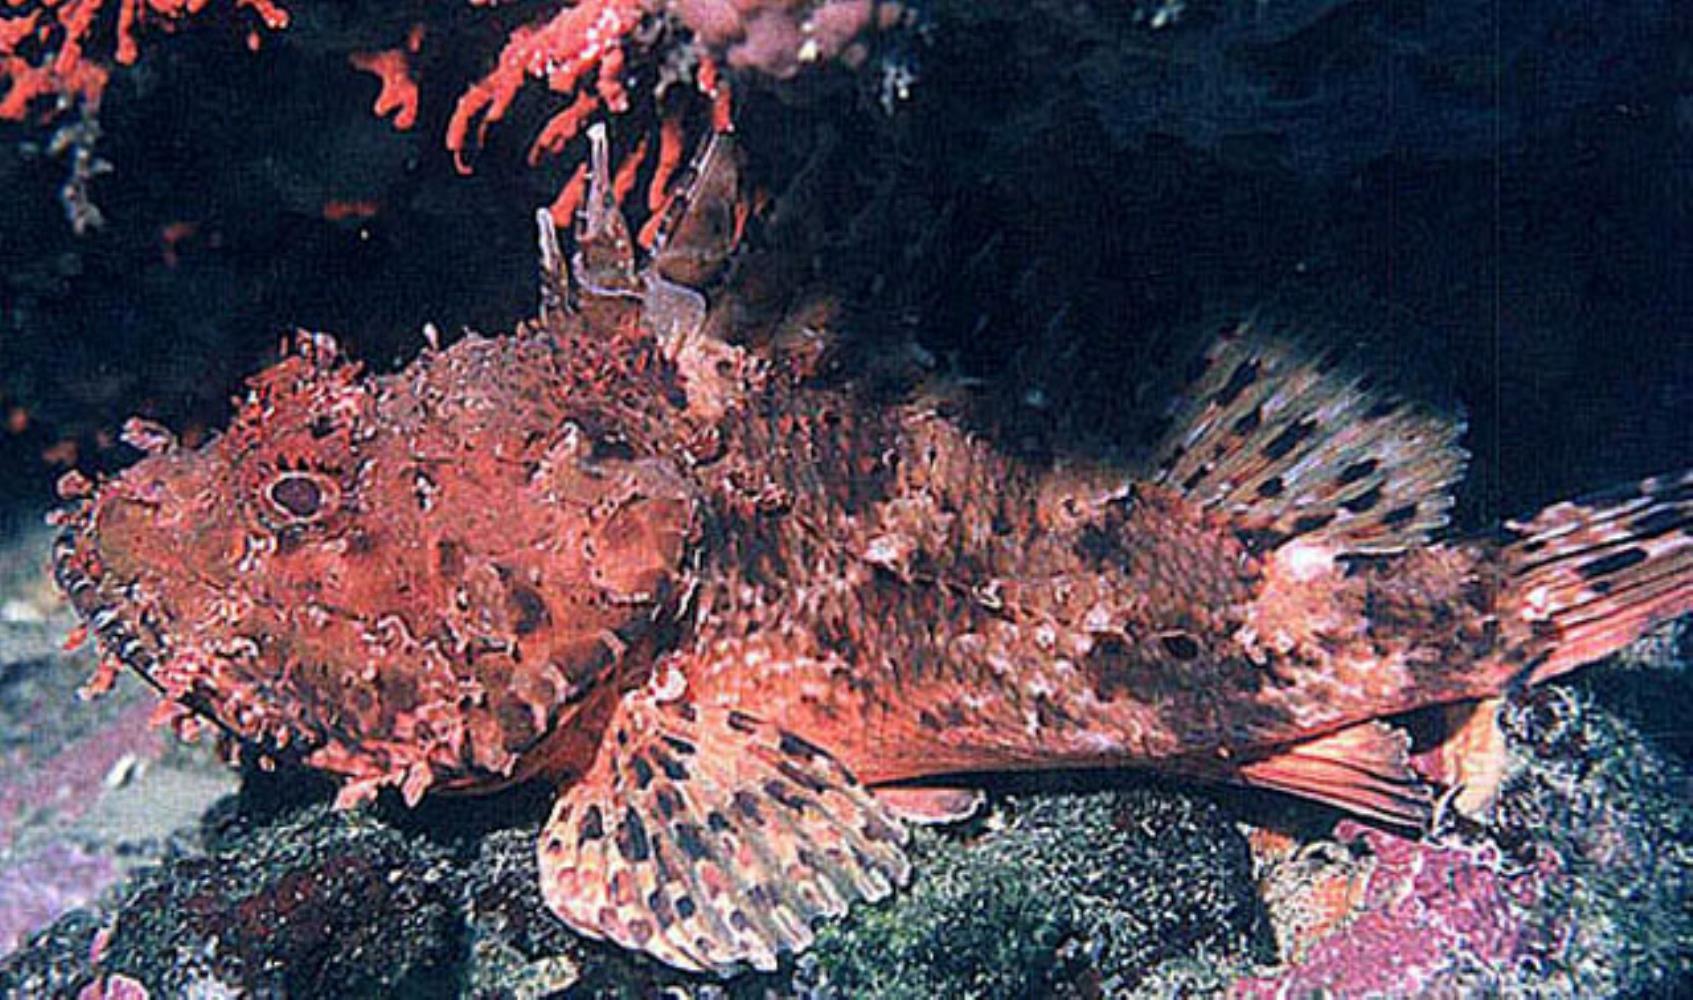 Red Scorpionfish